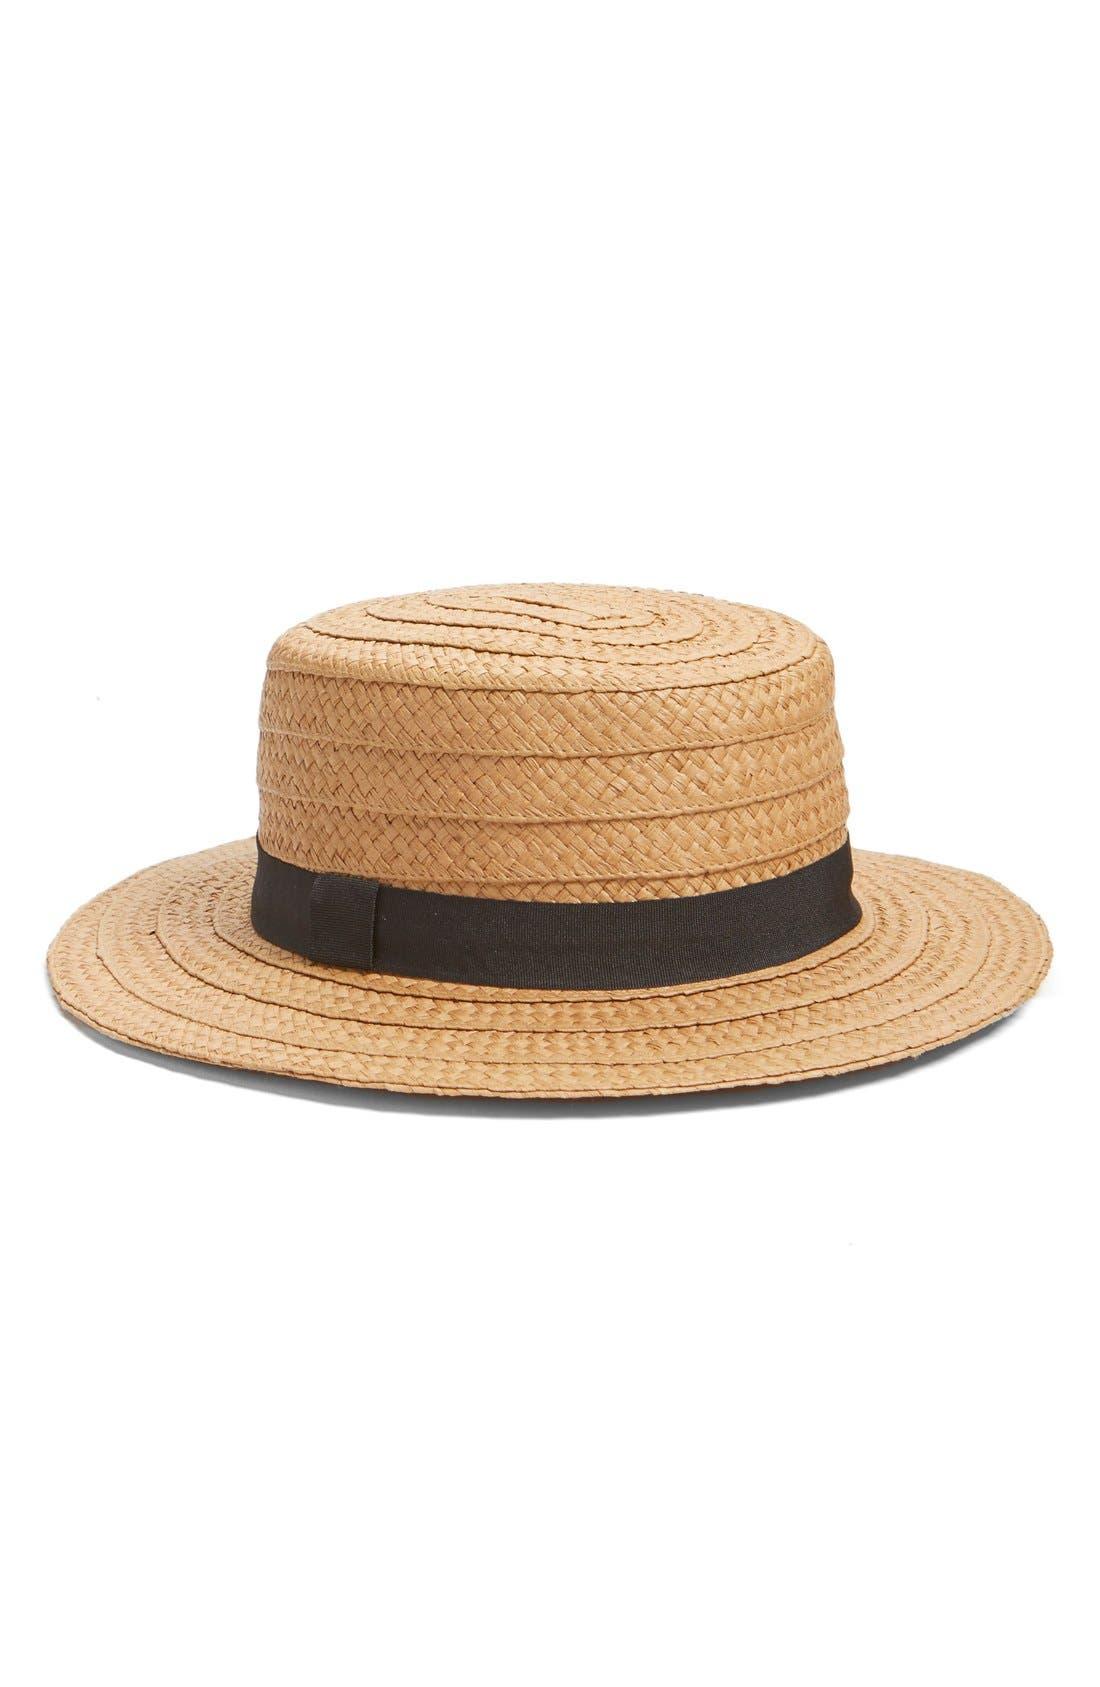 Alternate Image 1 Selected - Hinge Straw Boater Hat